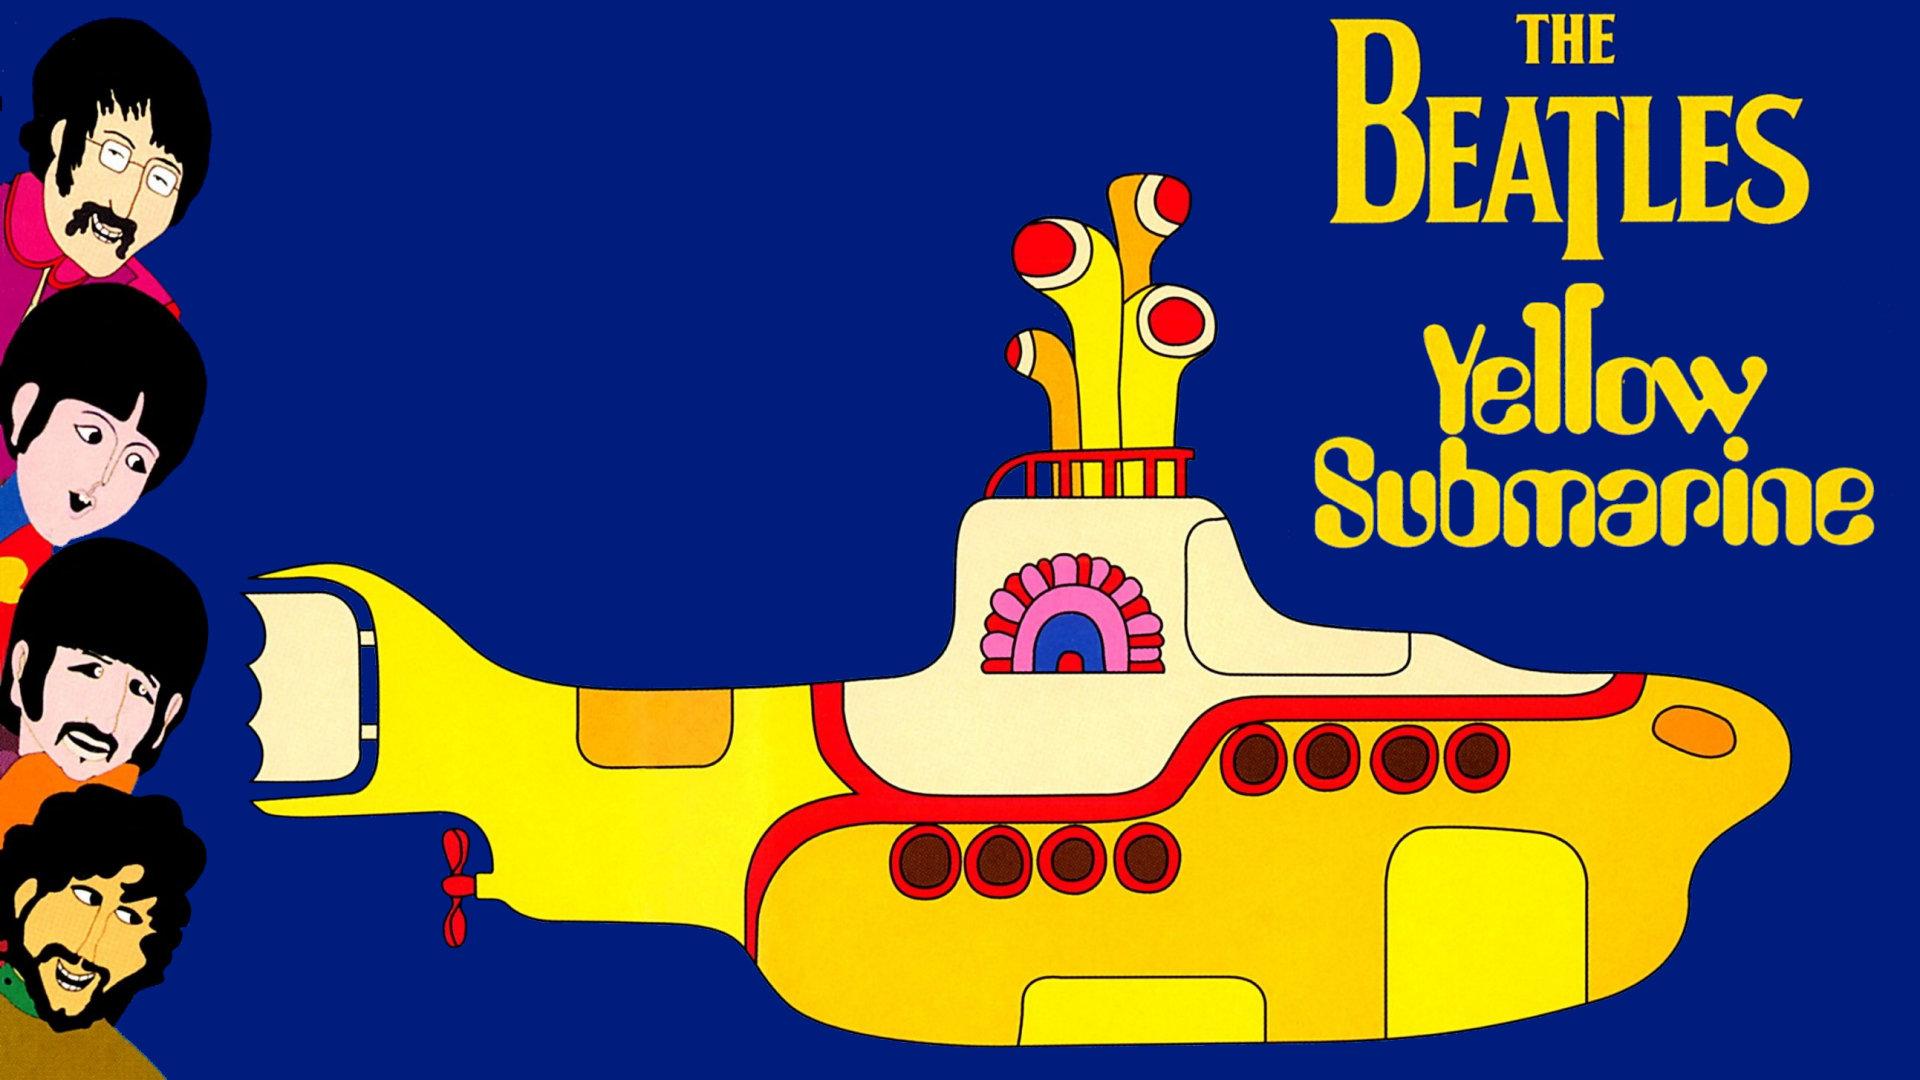 битлз желтая подводная лодка картинки